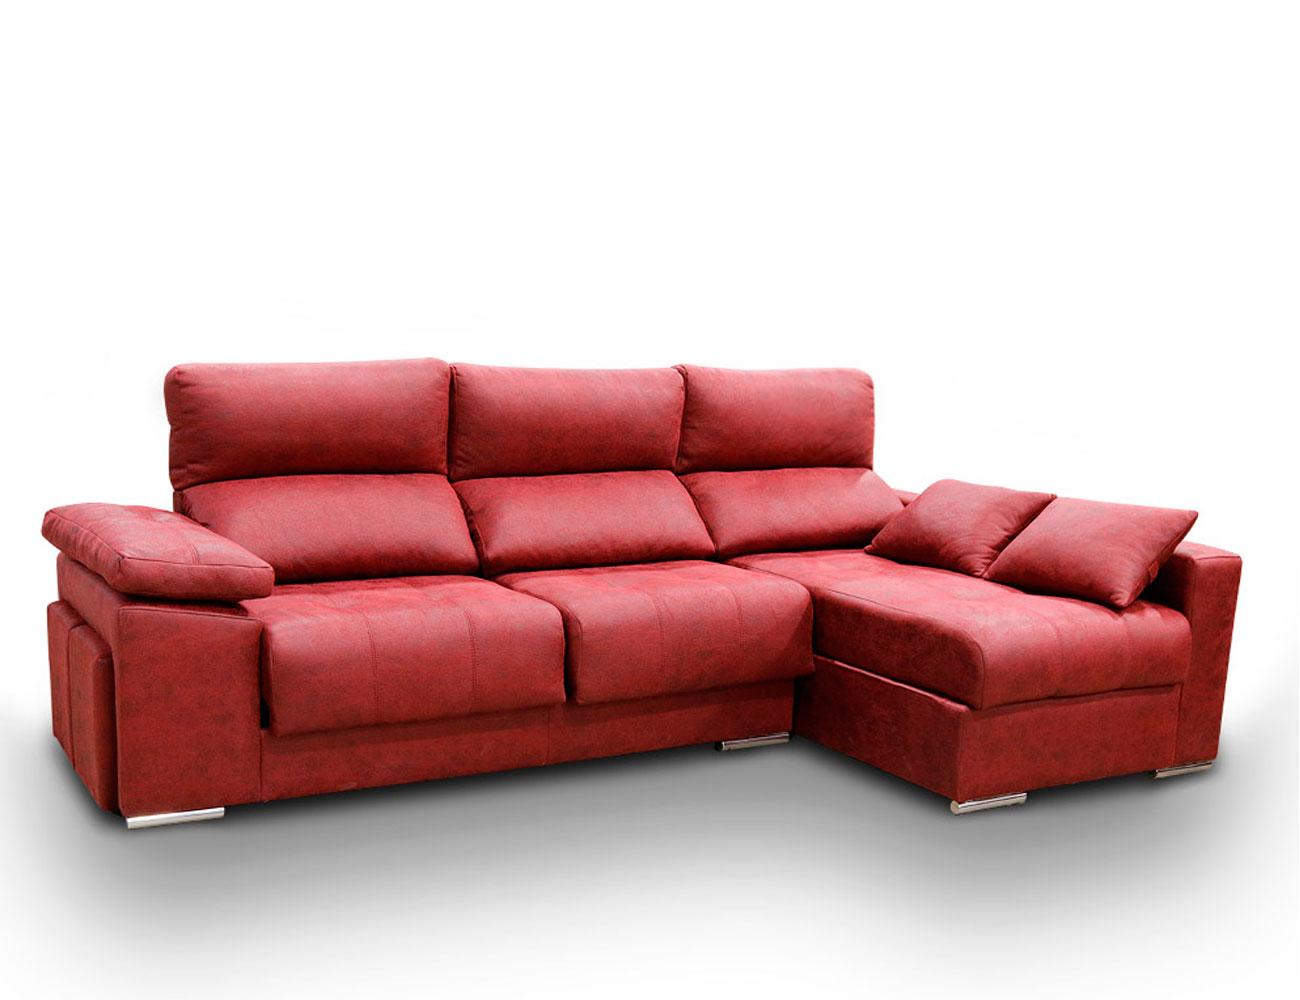 Sofa chaiselongue anti manchas rojo granate2